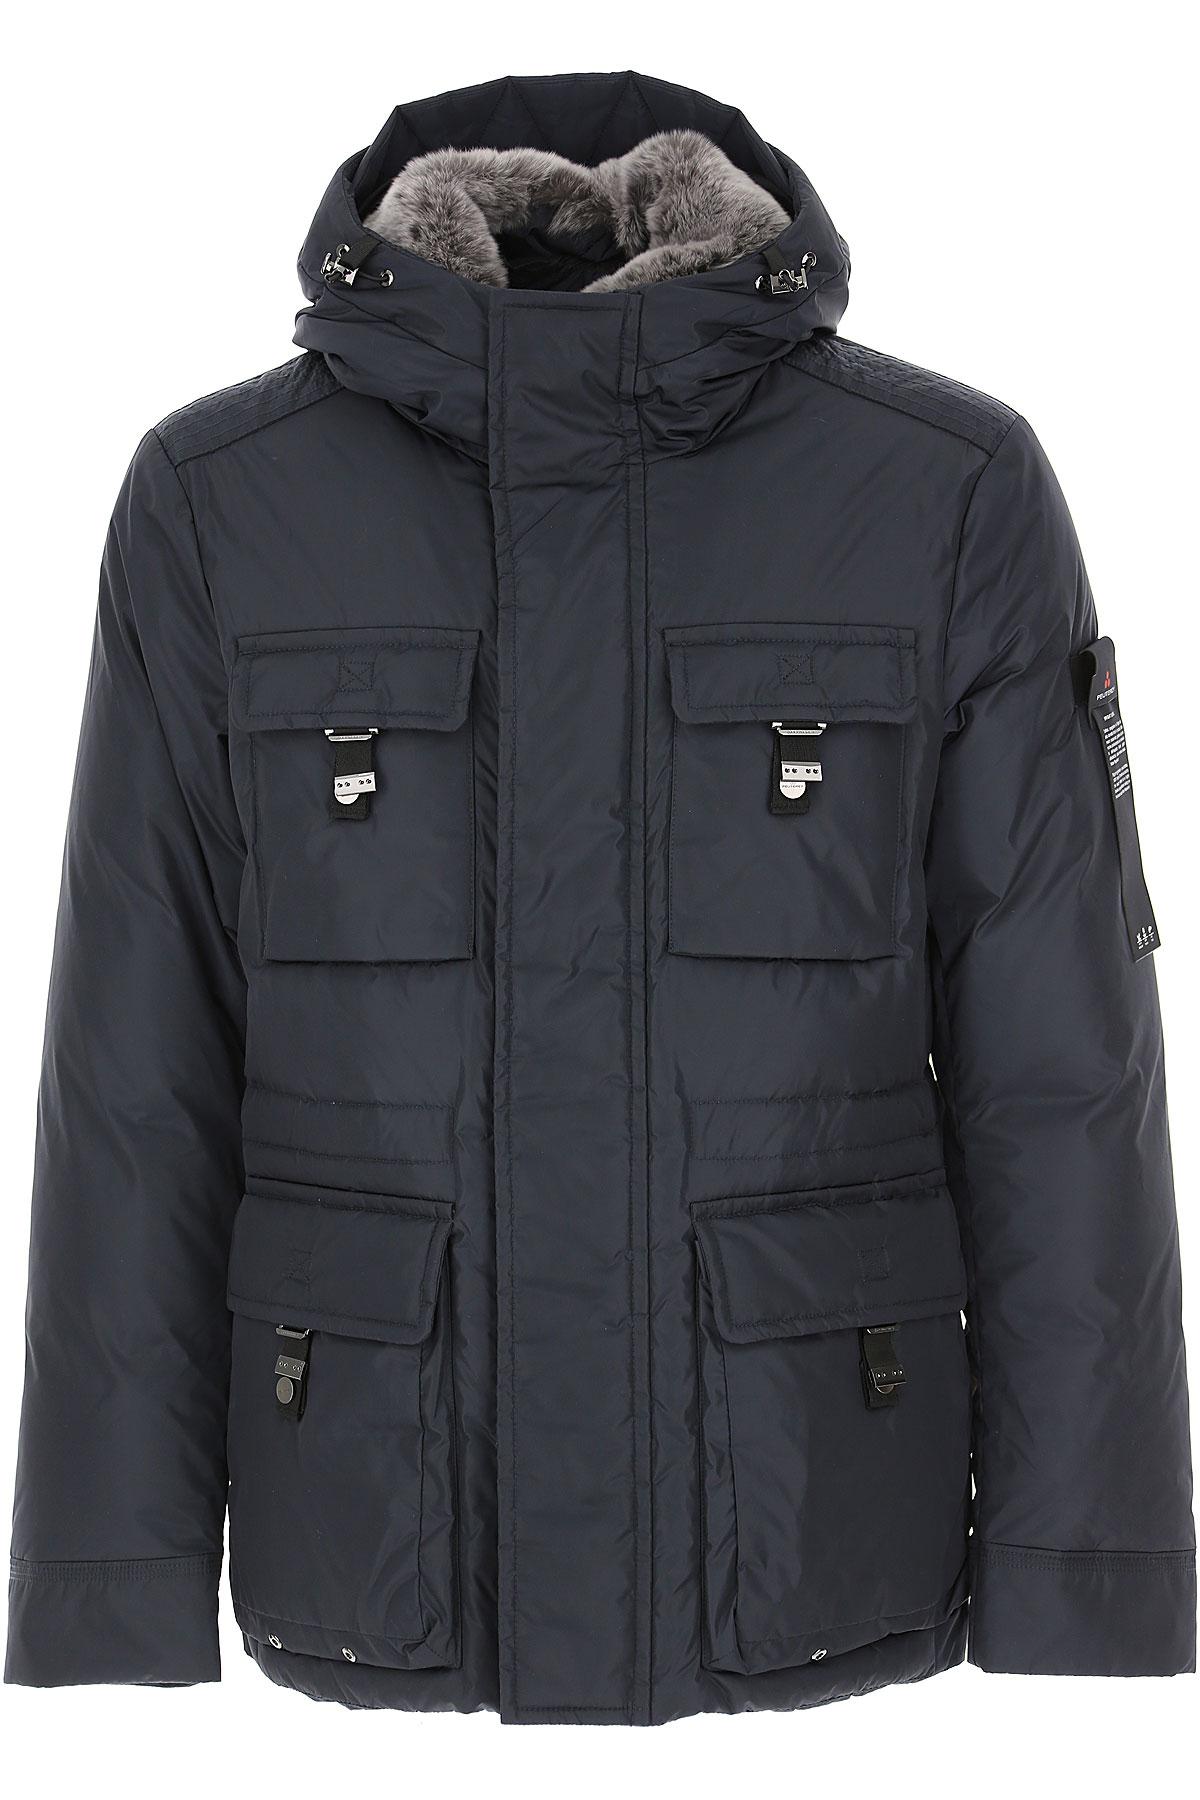 Peuterey Down Jacket for Men, Puffer Ski Jacket On Sale, Dark Navy Blue, Down, 2019, L M S XL XXL